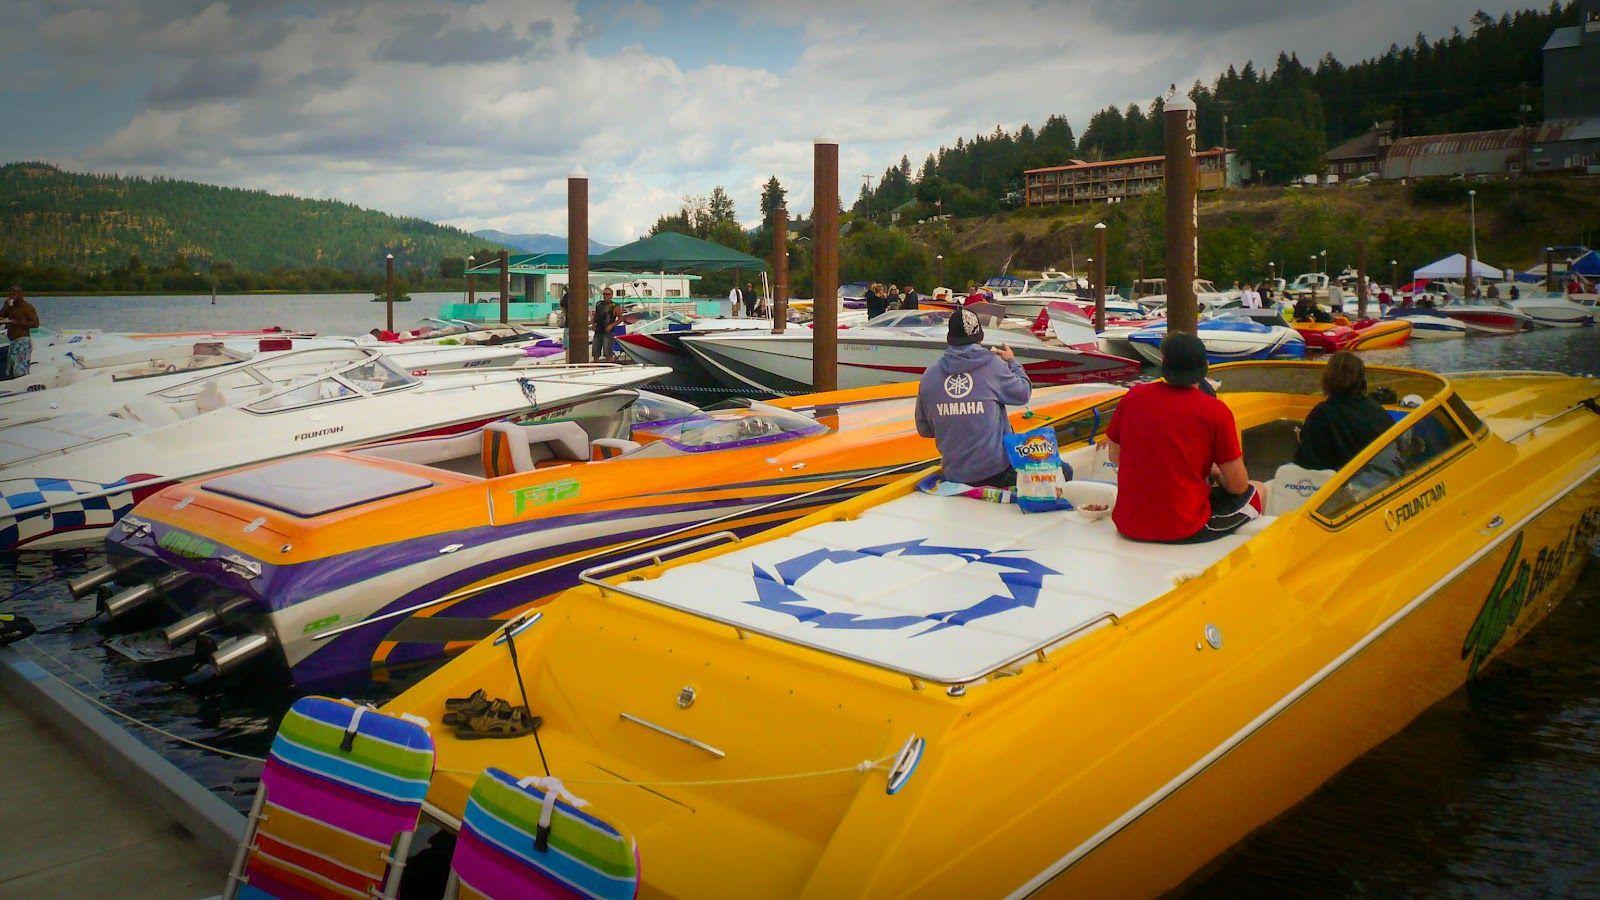 Coeur dalene performance boat regatta aug 18th